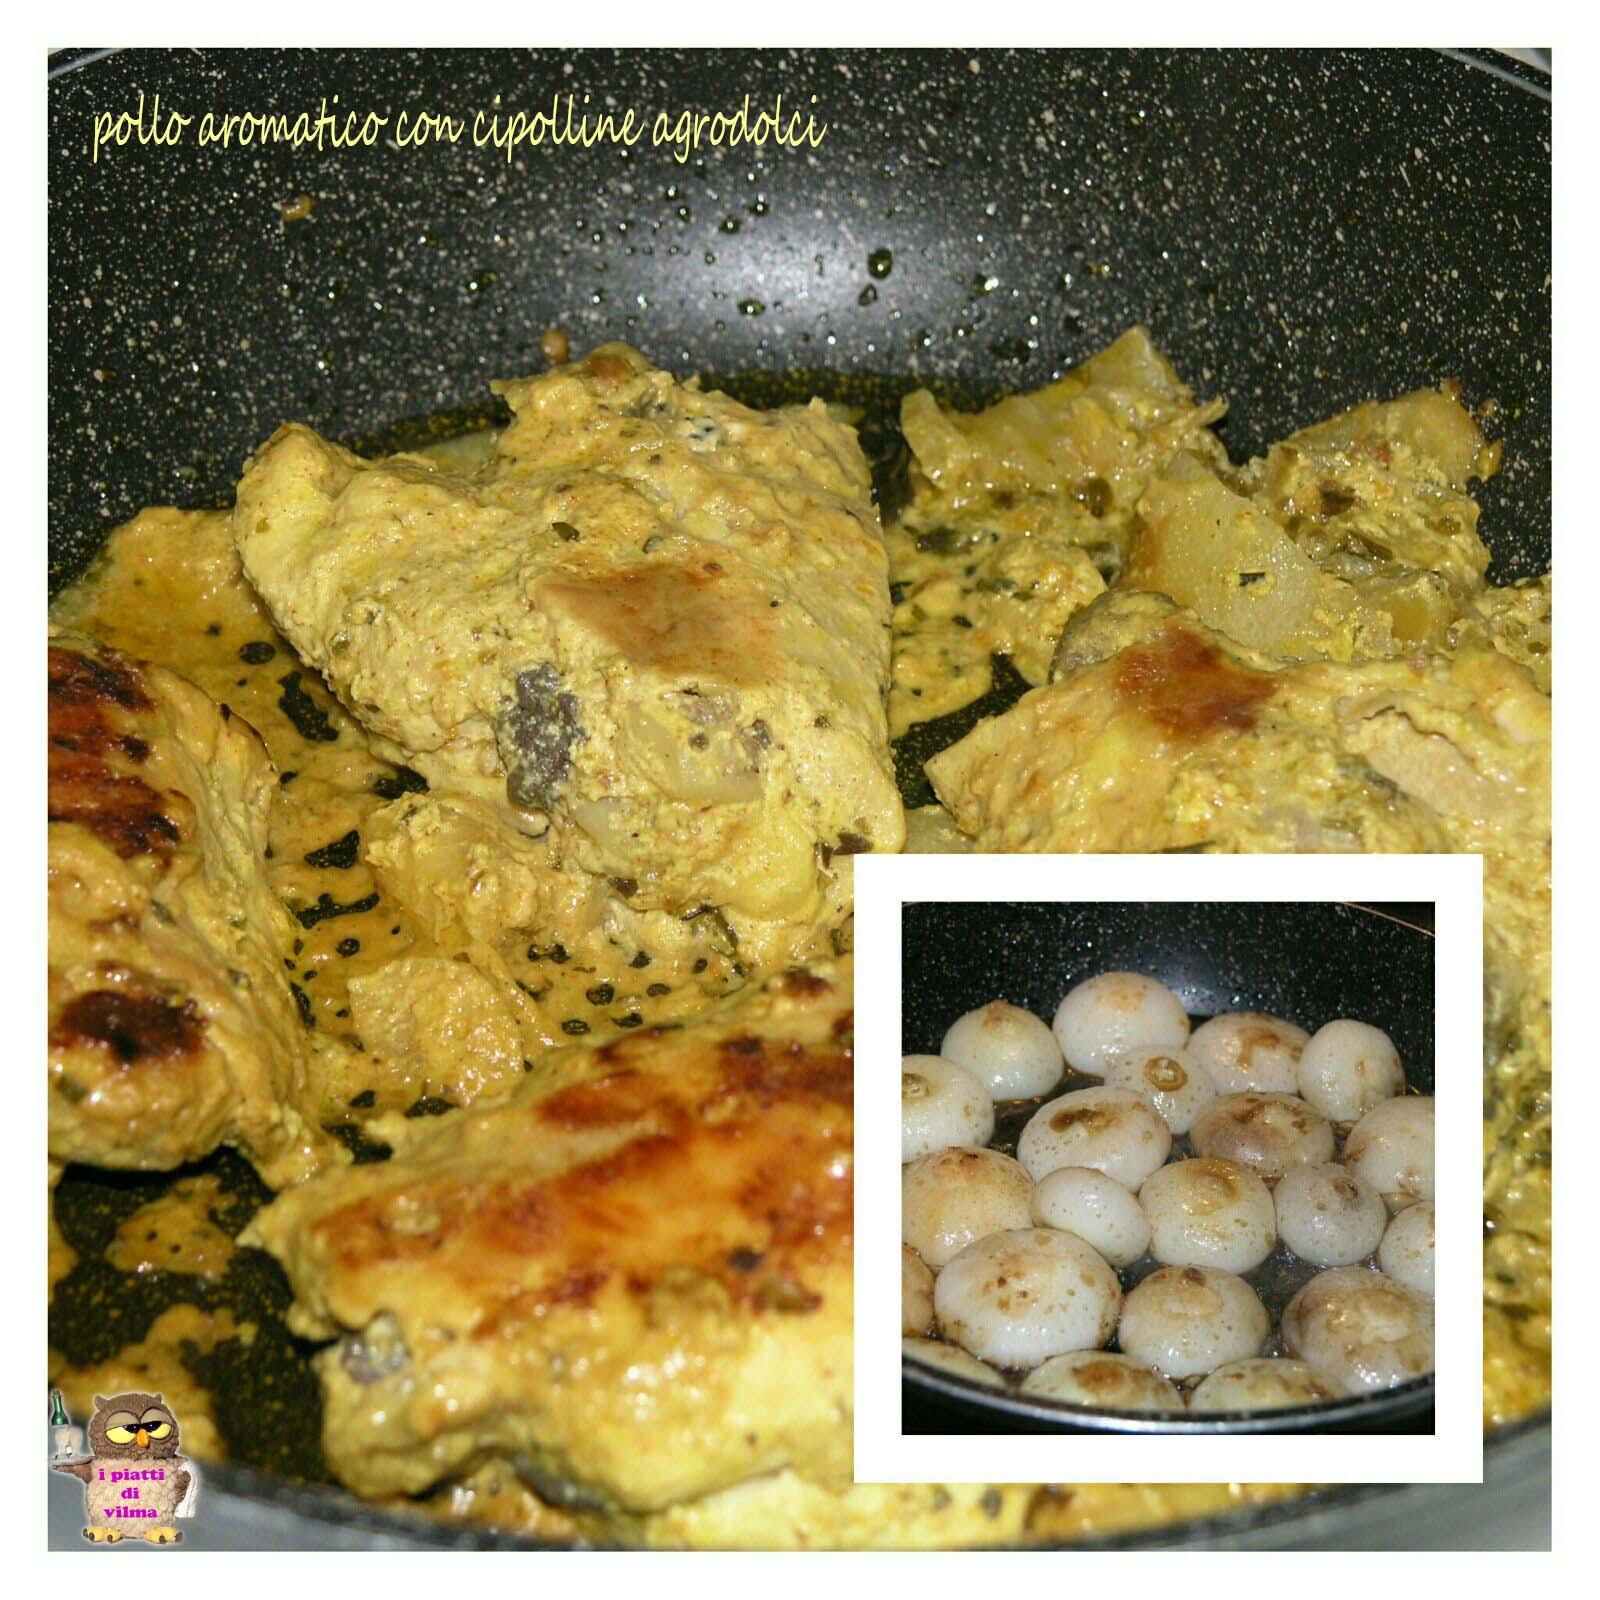 pollo aromatico con cipolline agrodolci